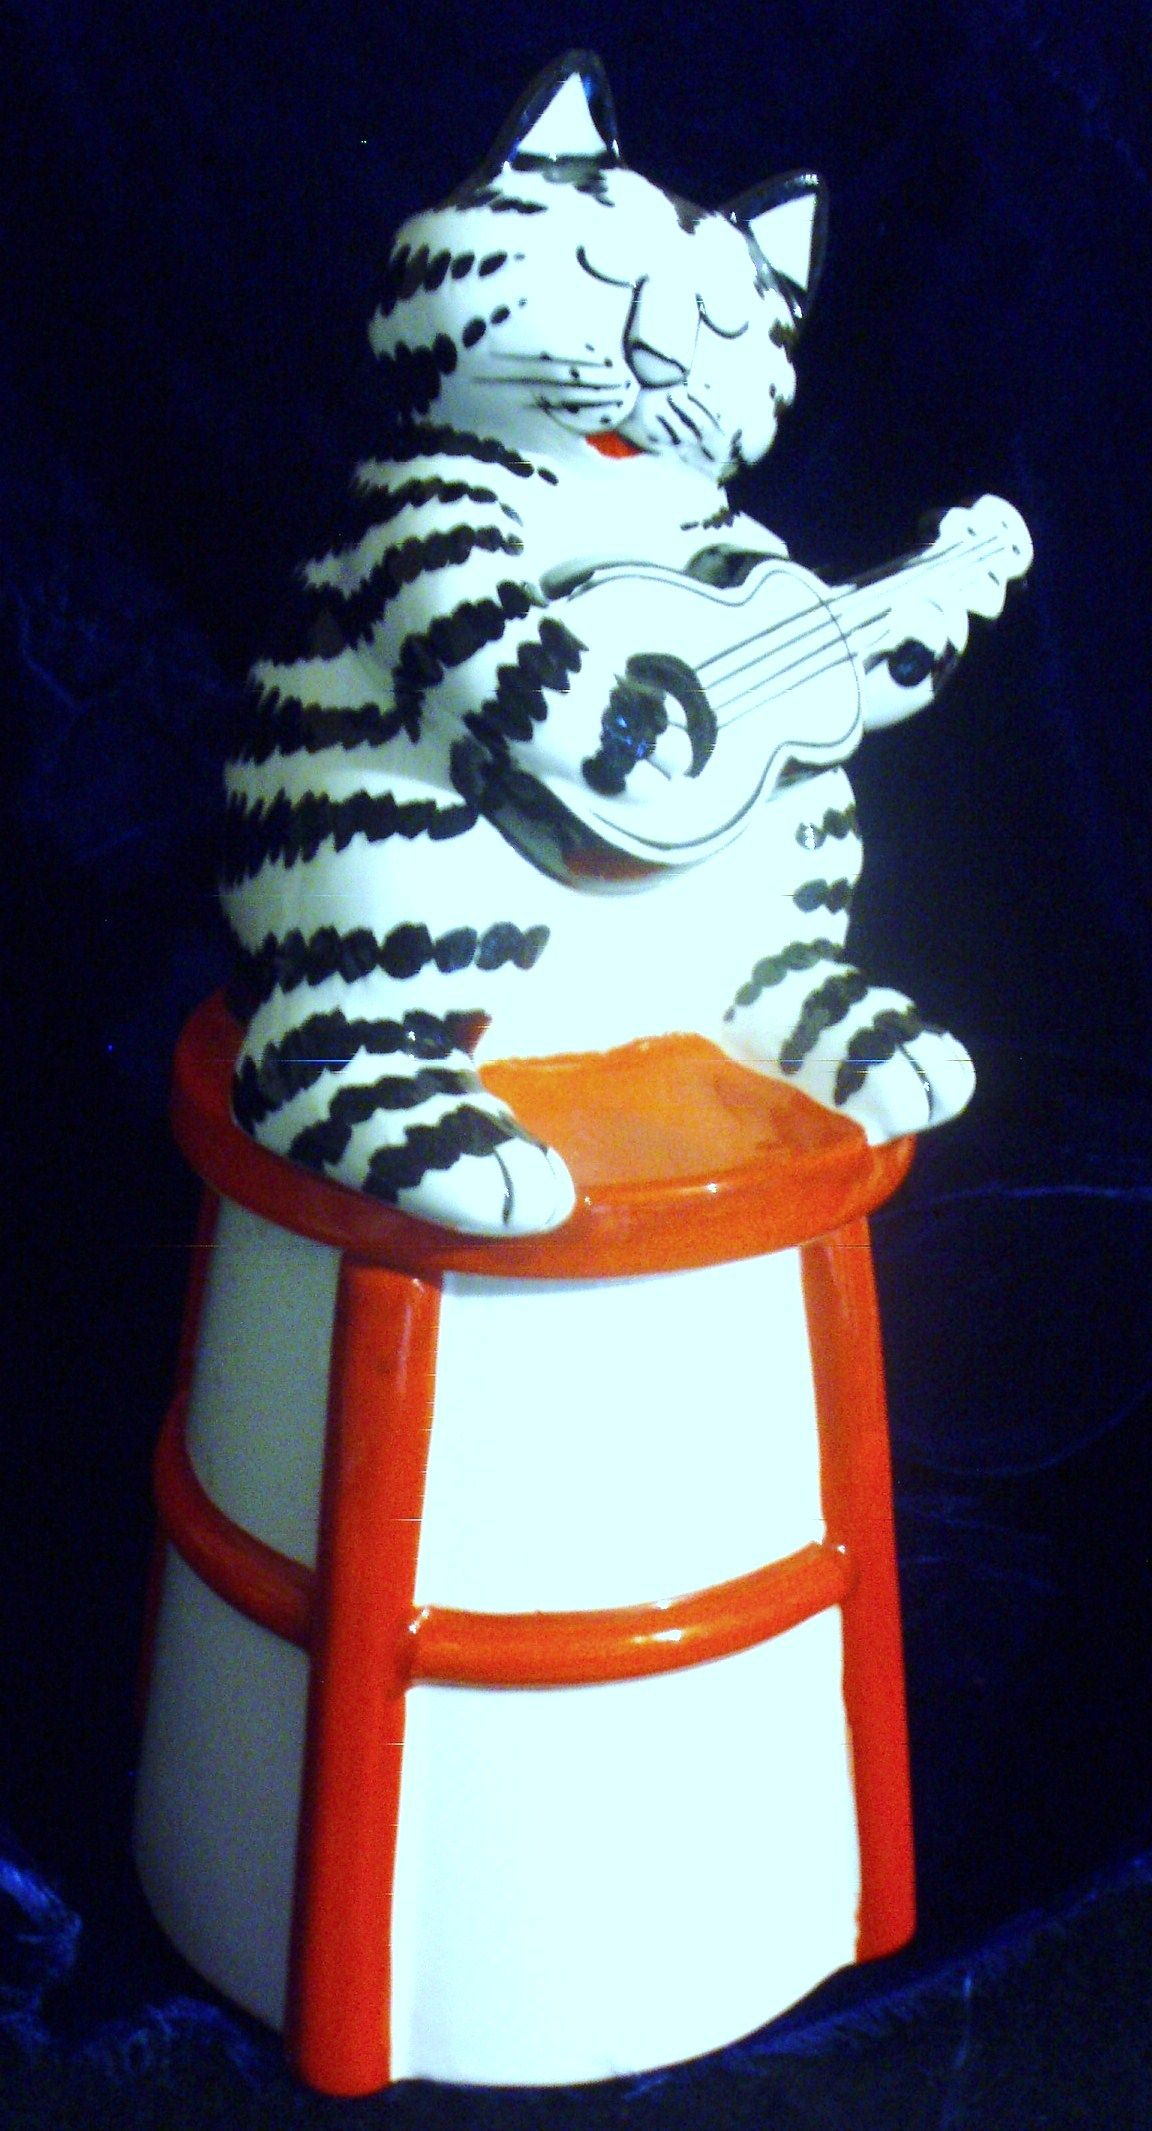 J KLIBAN FOR SIGMA VINTAGE FIGURAL COOKIE JAR CAT PLAYING GUITAR C. 1970-80'S           (MY EBAY 45.00)   SOLD